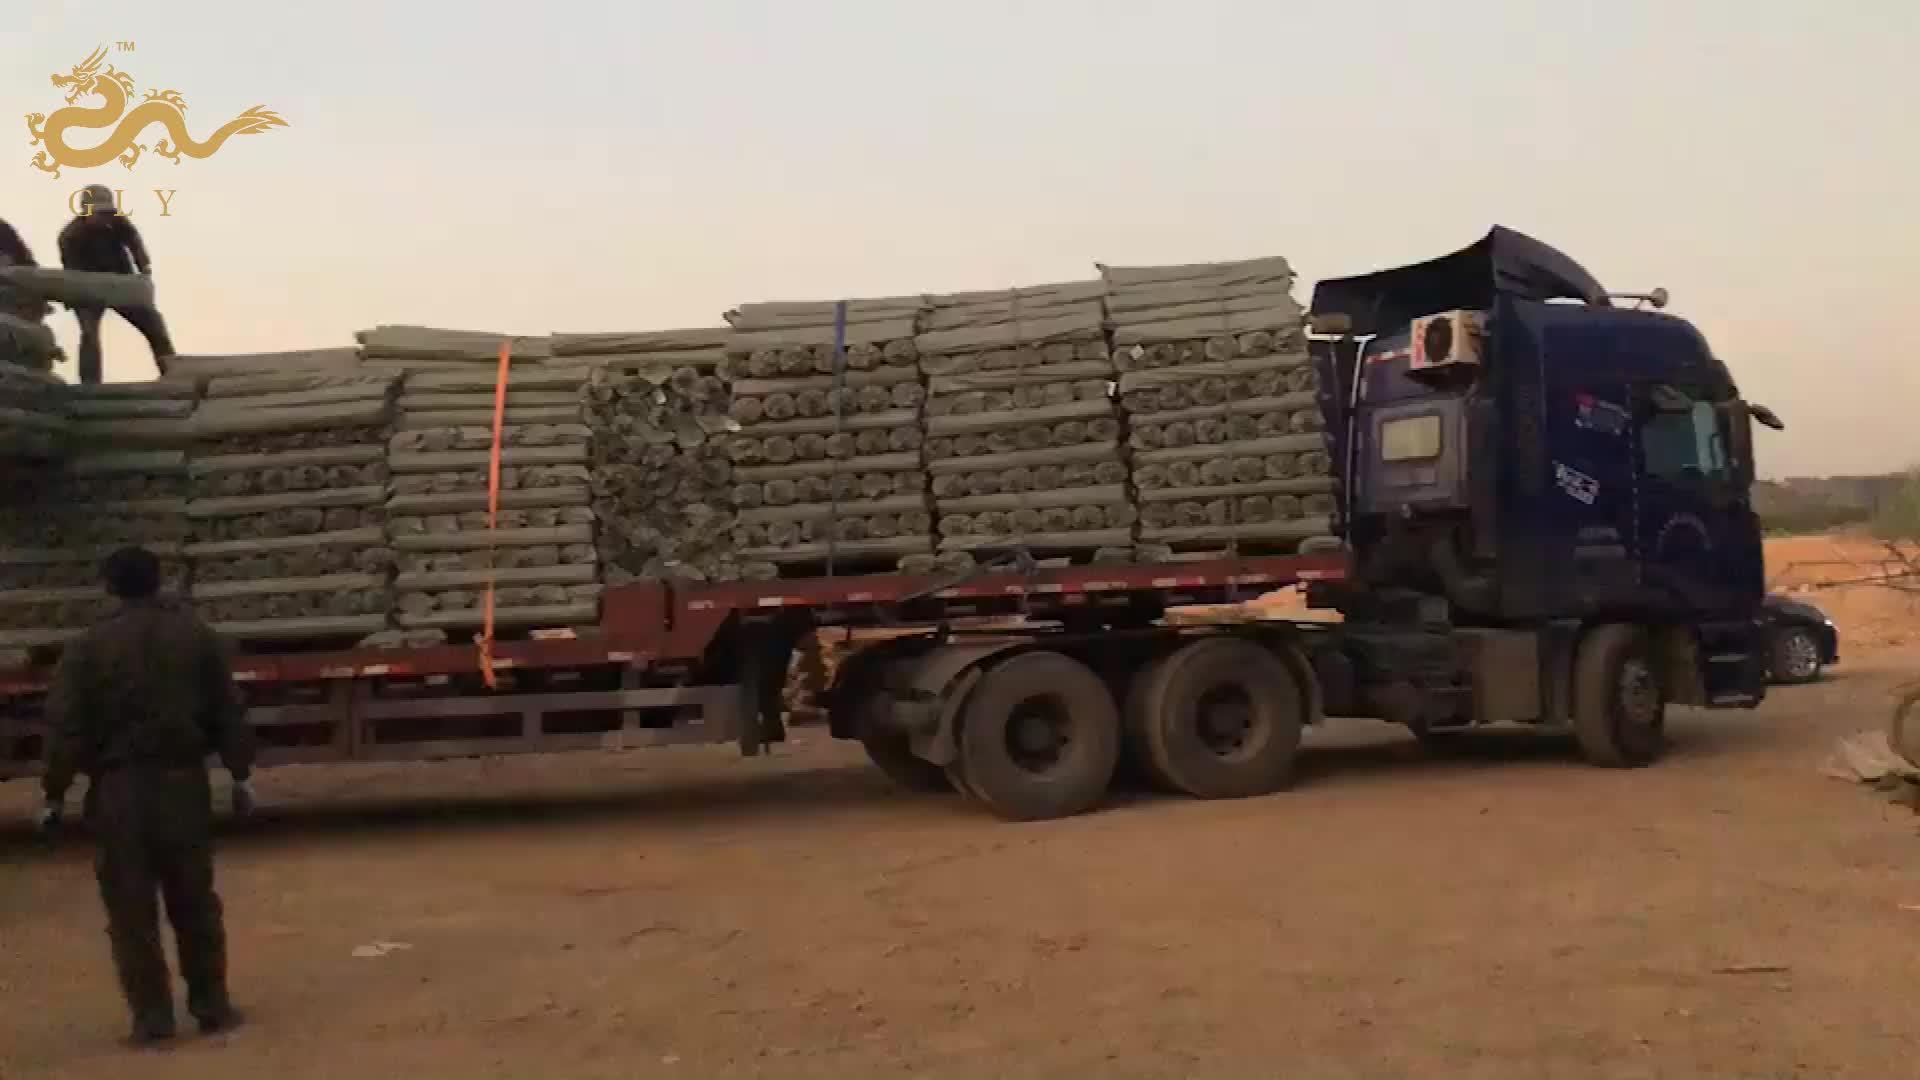 PVC วัสดุทำความสะอาดผลิตภัณฑ์ไม้สำหรับ MOB Mop